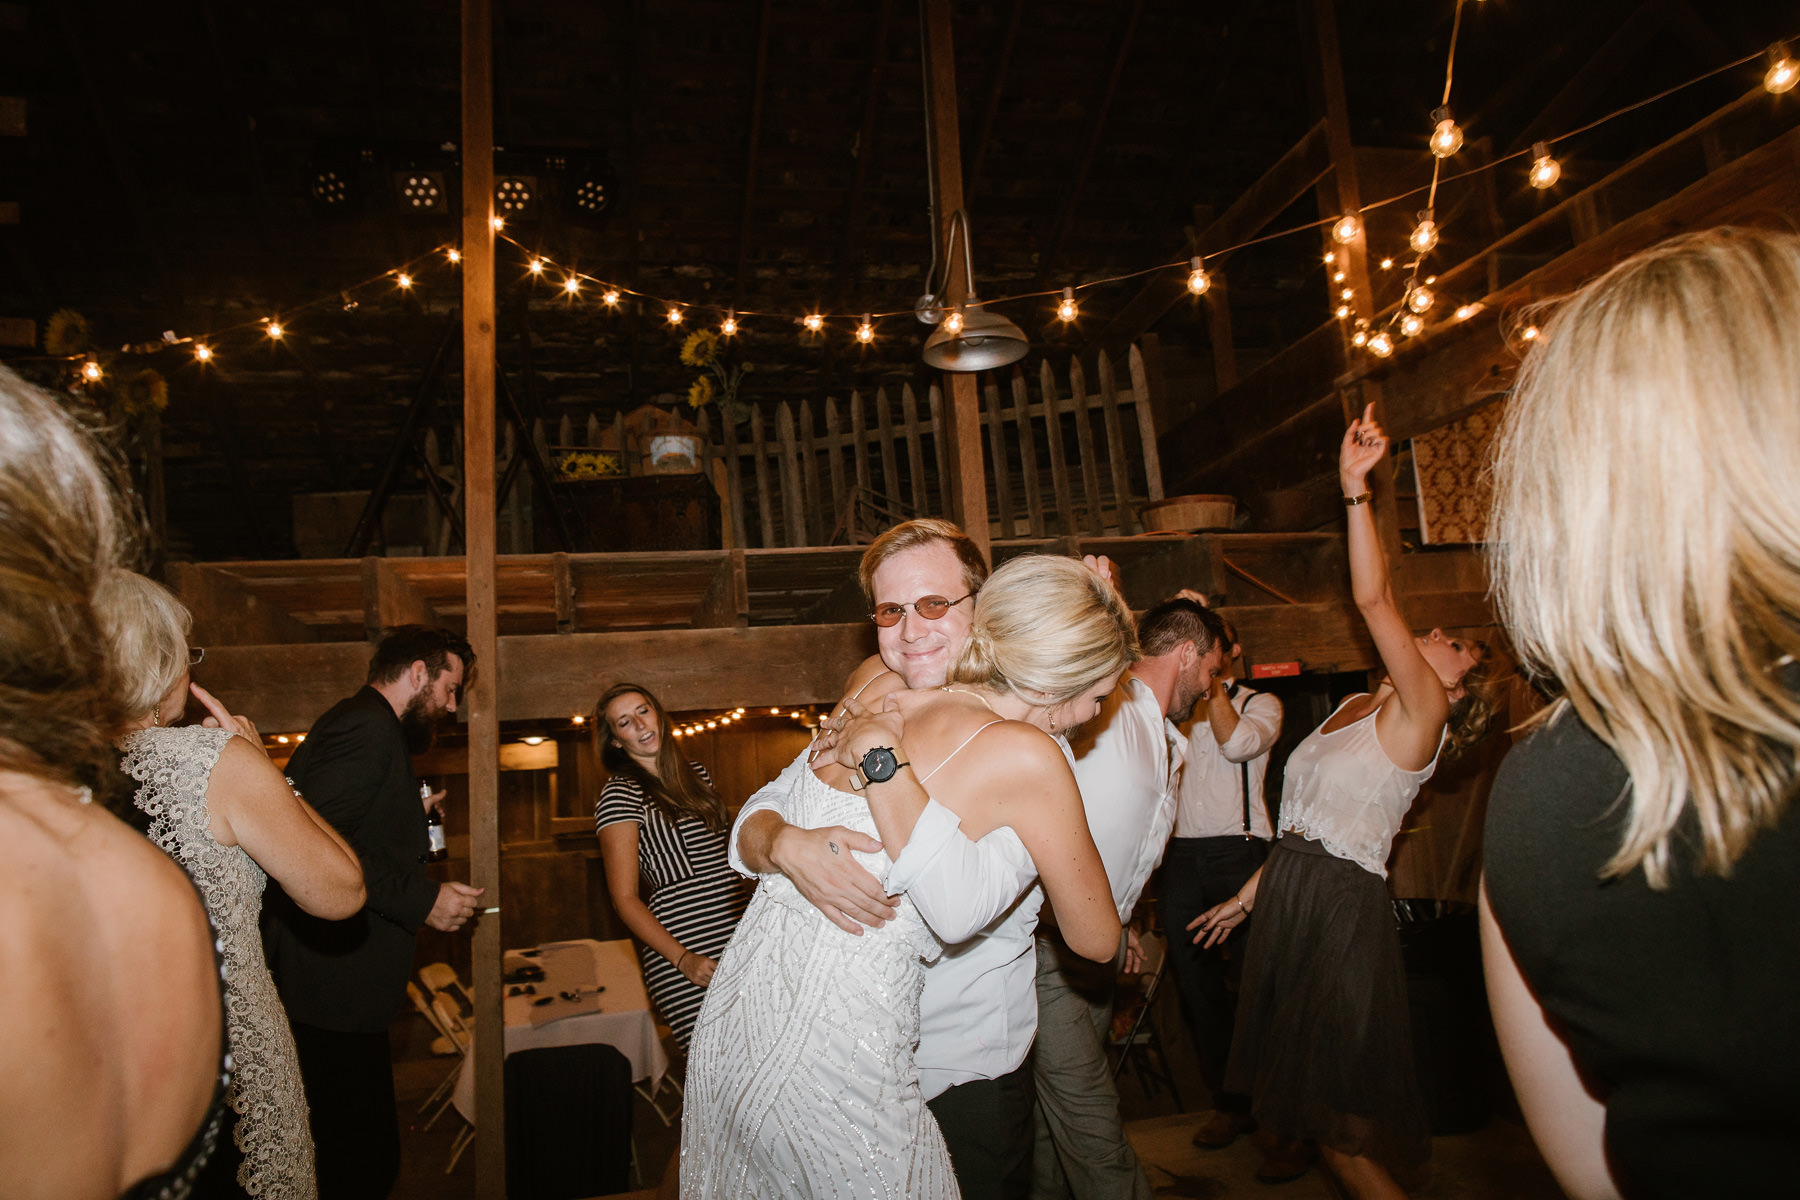 Alldredge Orchard Kansas City_Kindling Wedding Photography BLOG 93.JPG